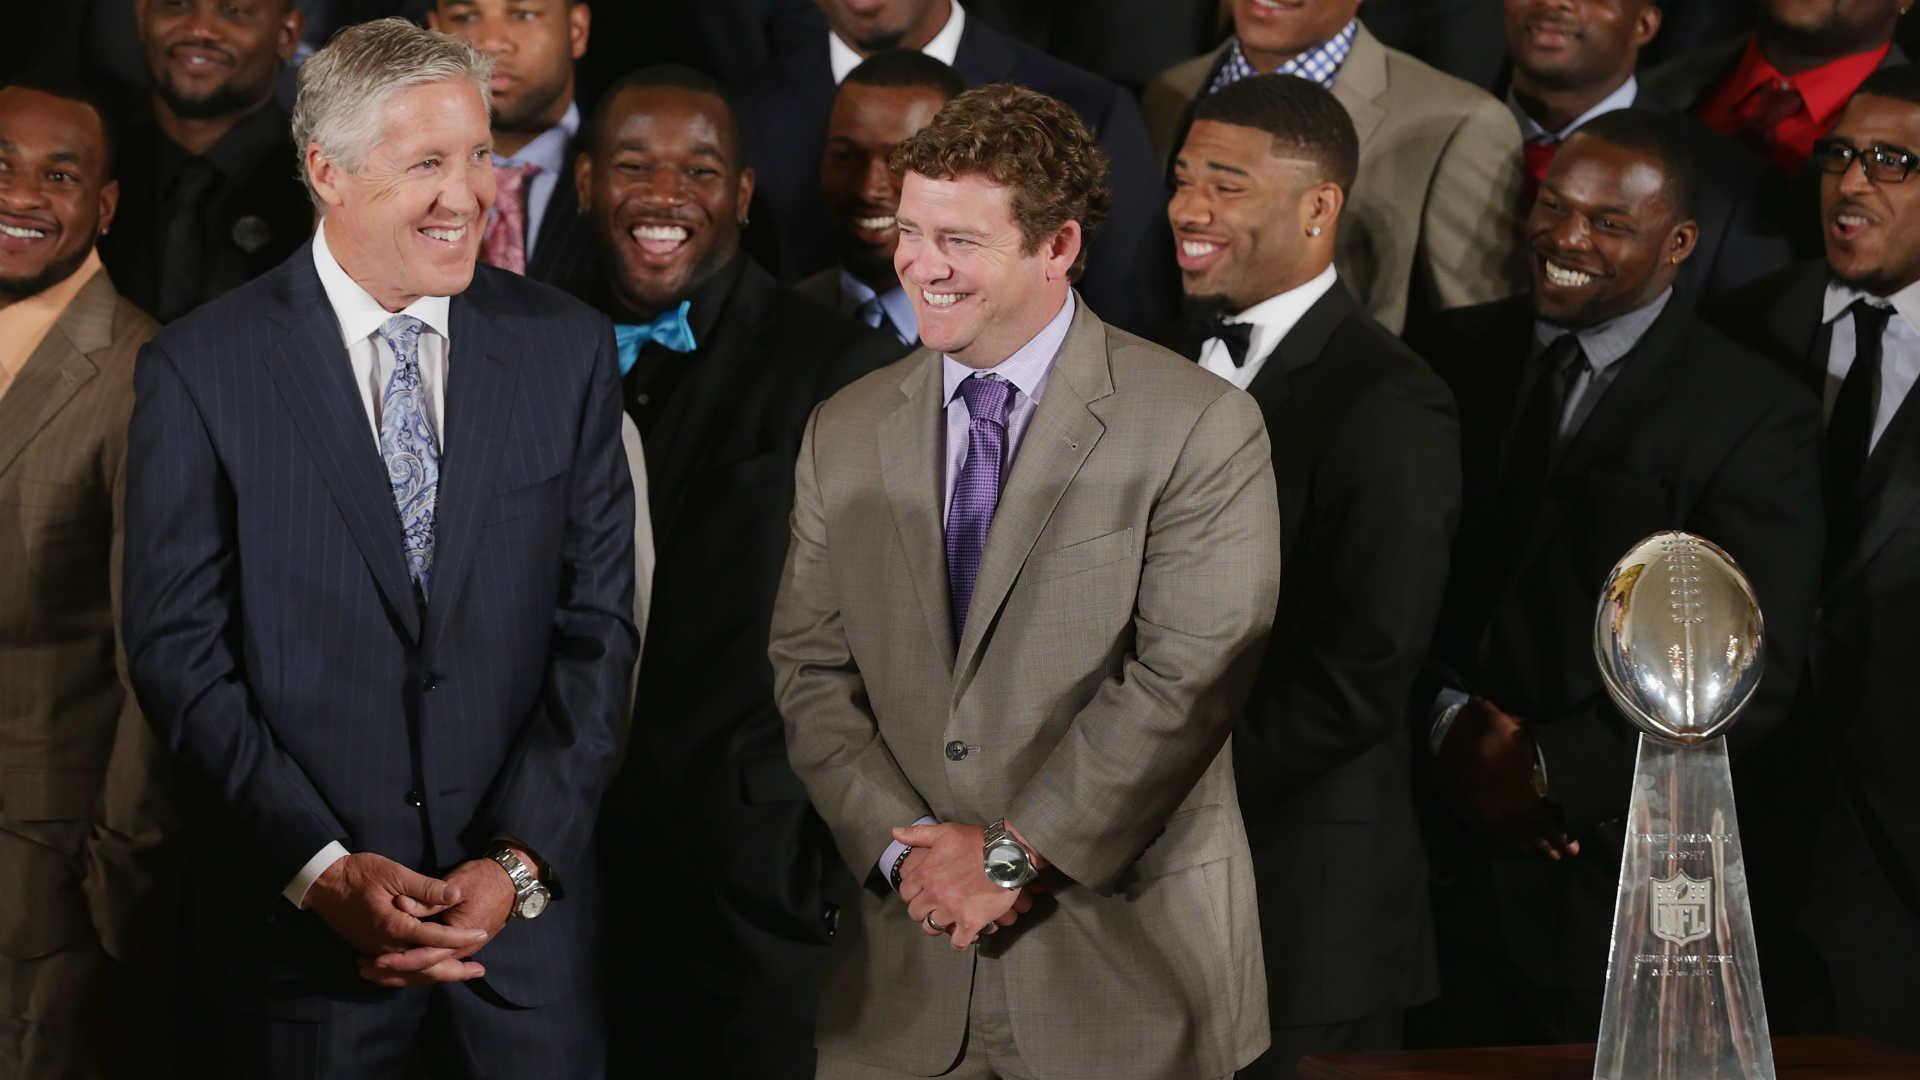 Colin Kaepernick grievance: Seahawks coach Pete Carroll, GM John Schneider deposed, reports say - NFL ...